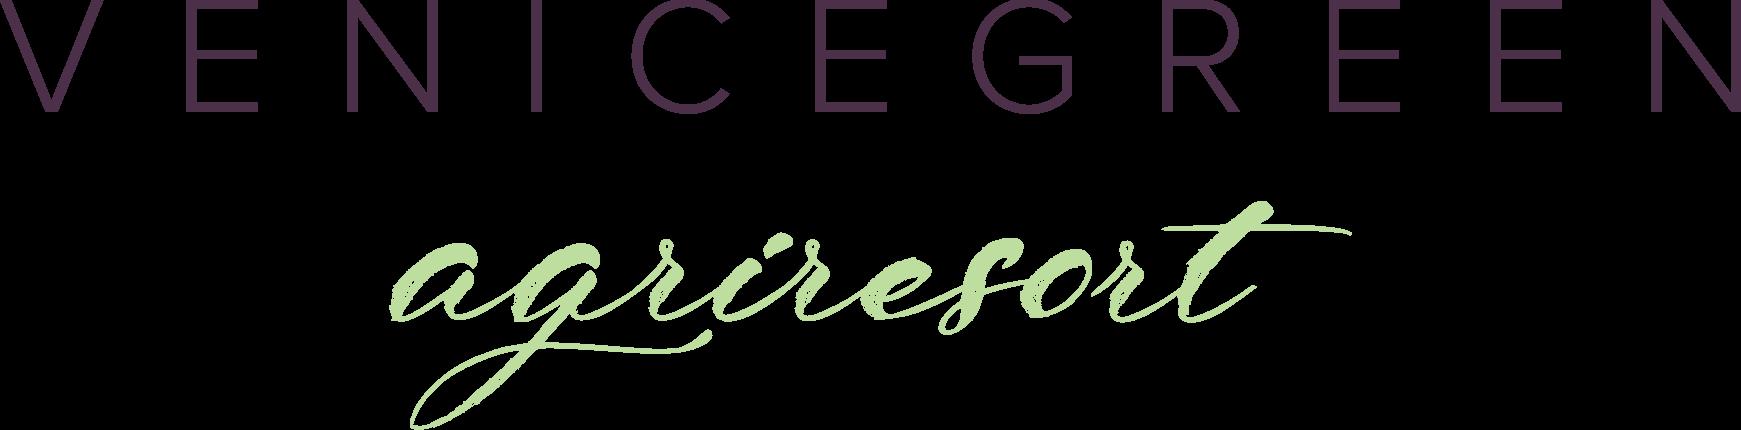 Logo Venice Green Agriresot